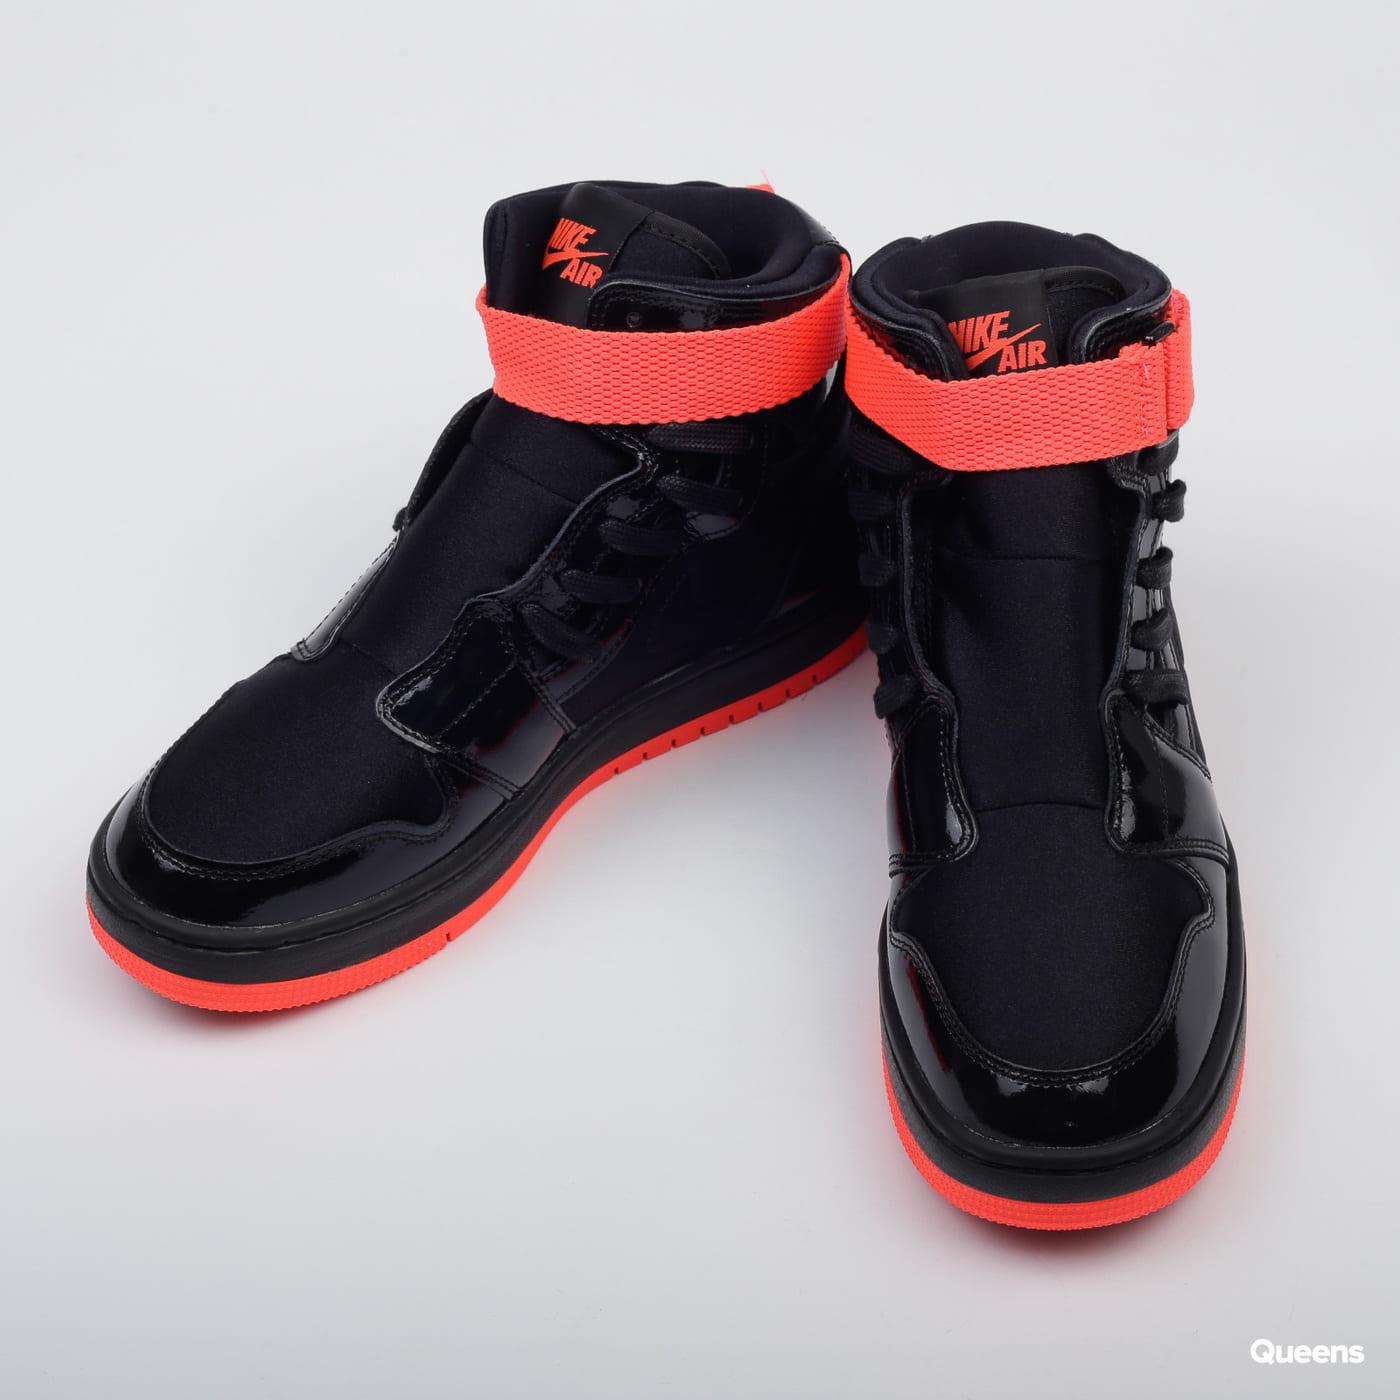 Jordan WMNS Air Jordan 1 Nova XX black / bright crimson